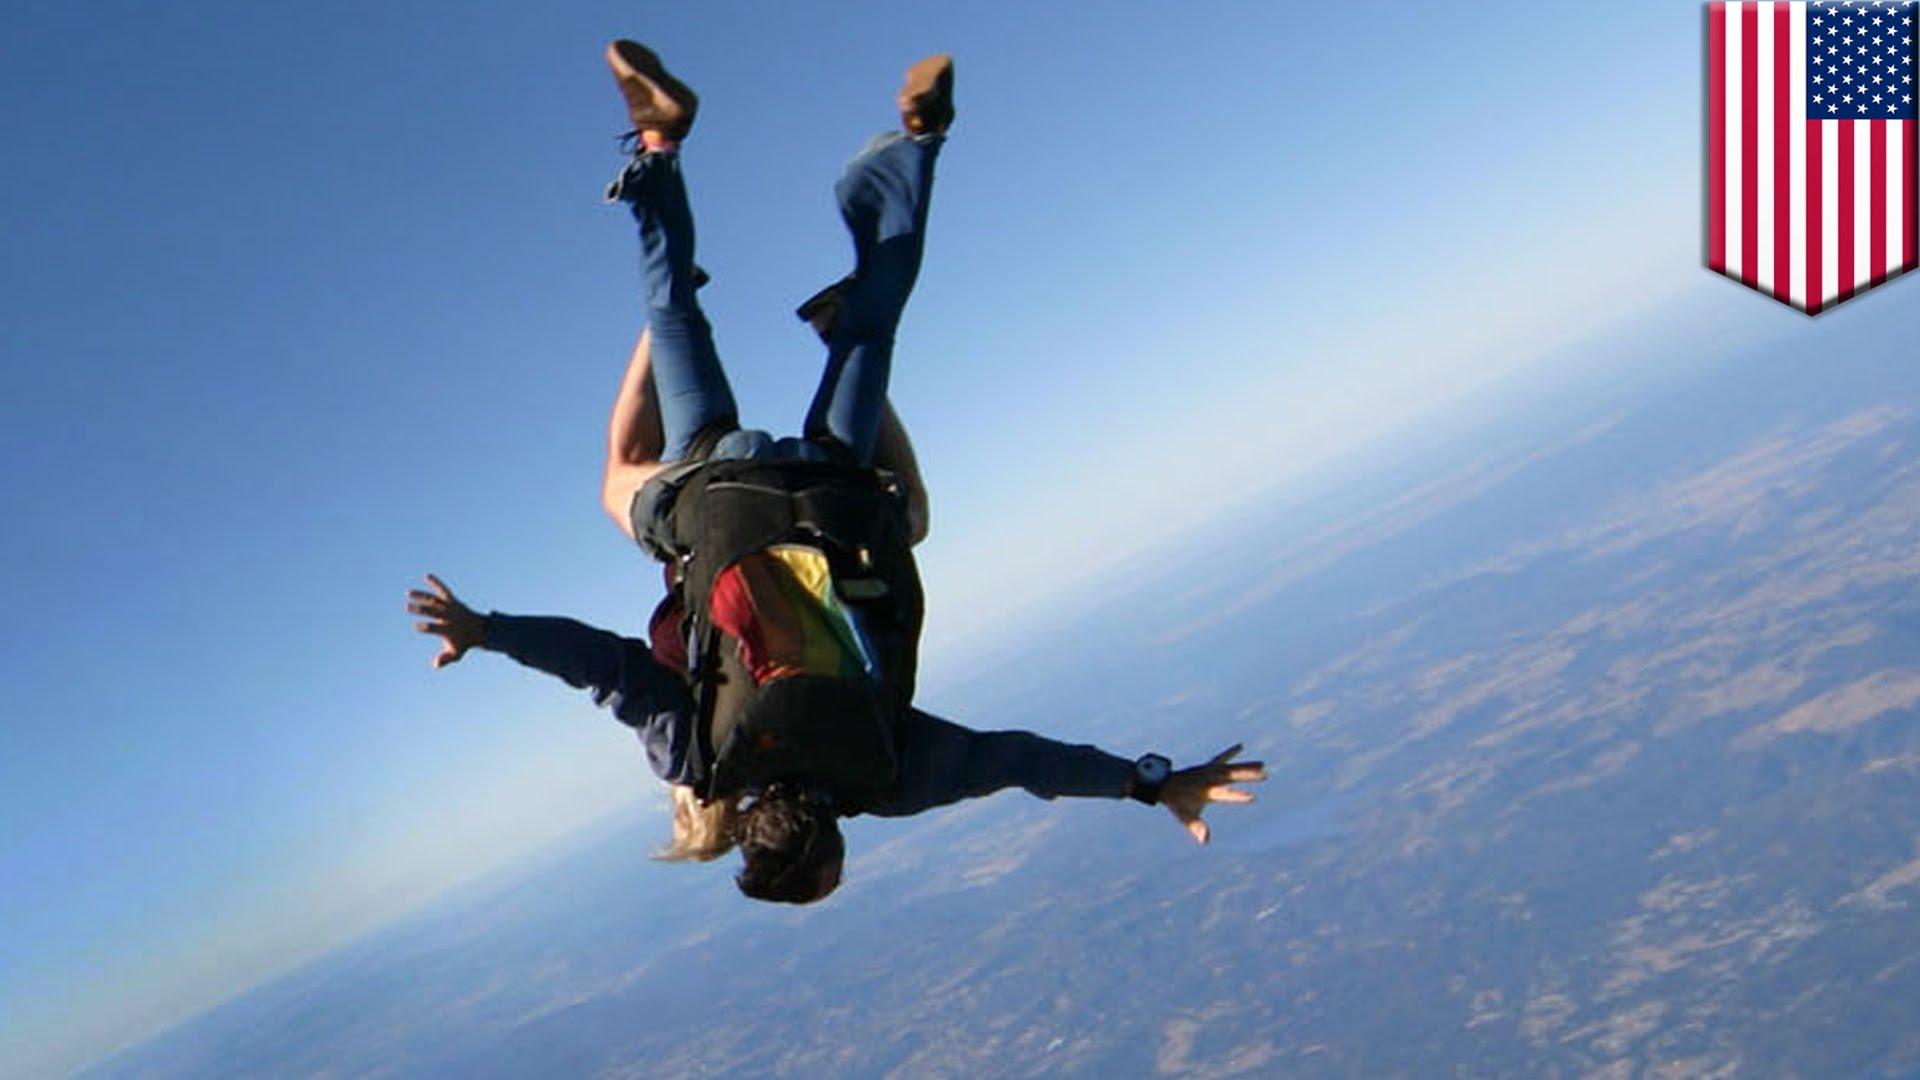 Tandem parachuting 2 photo